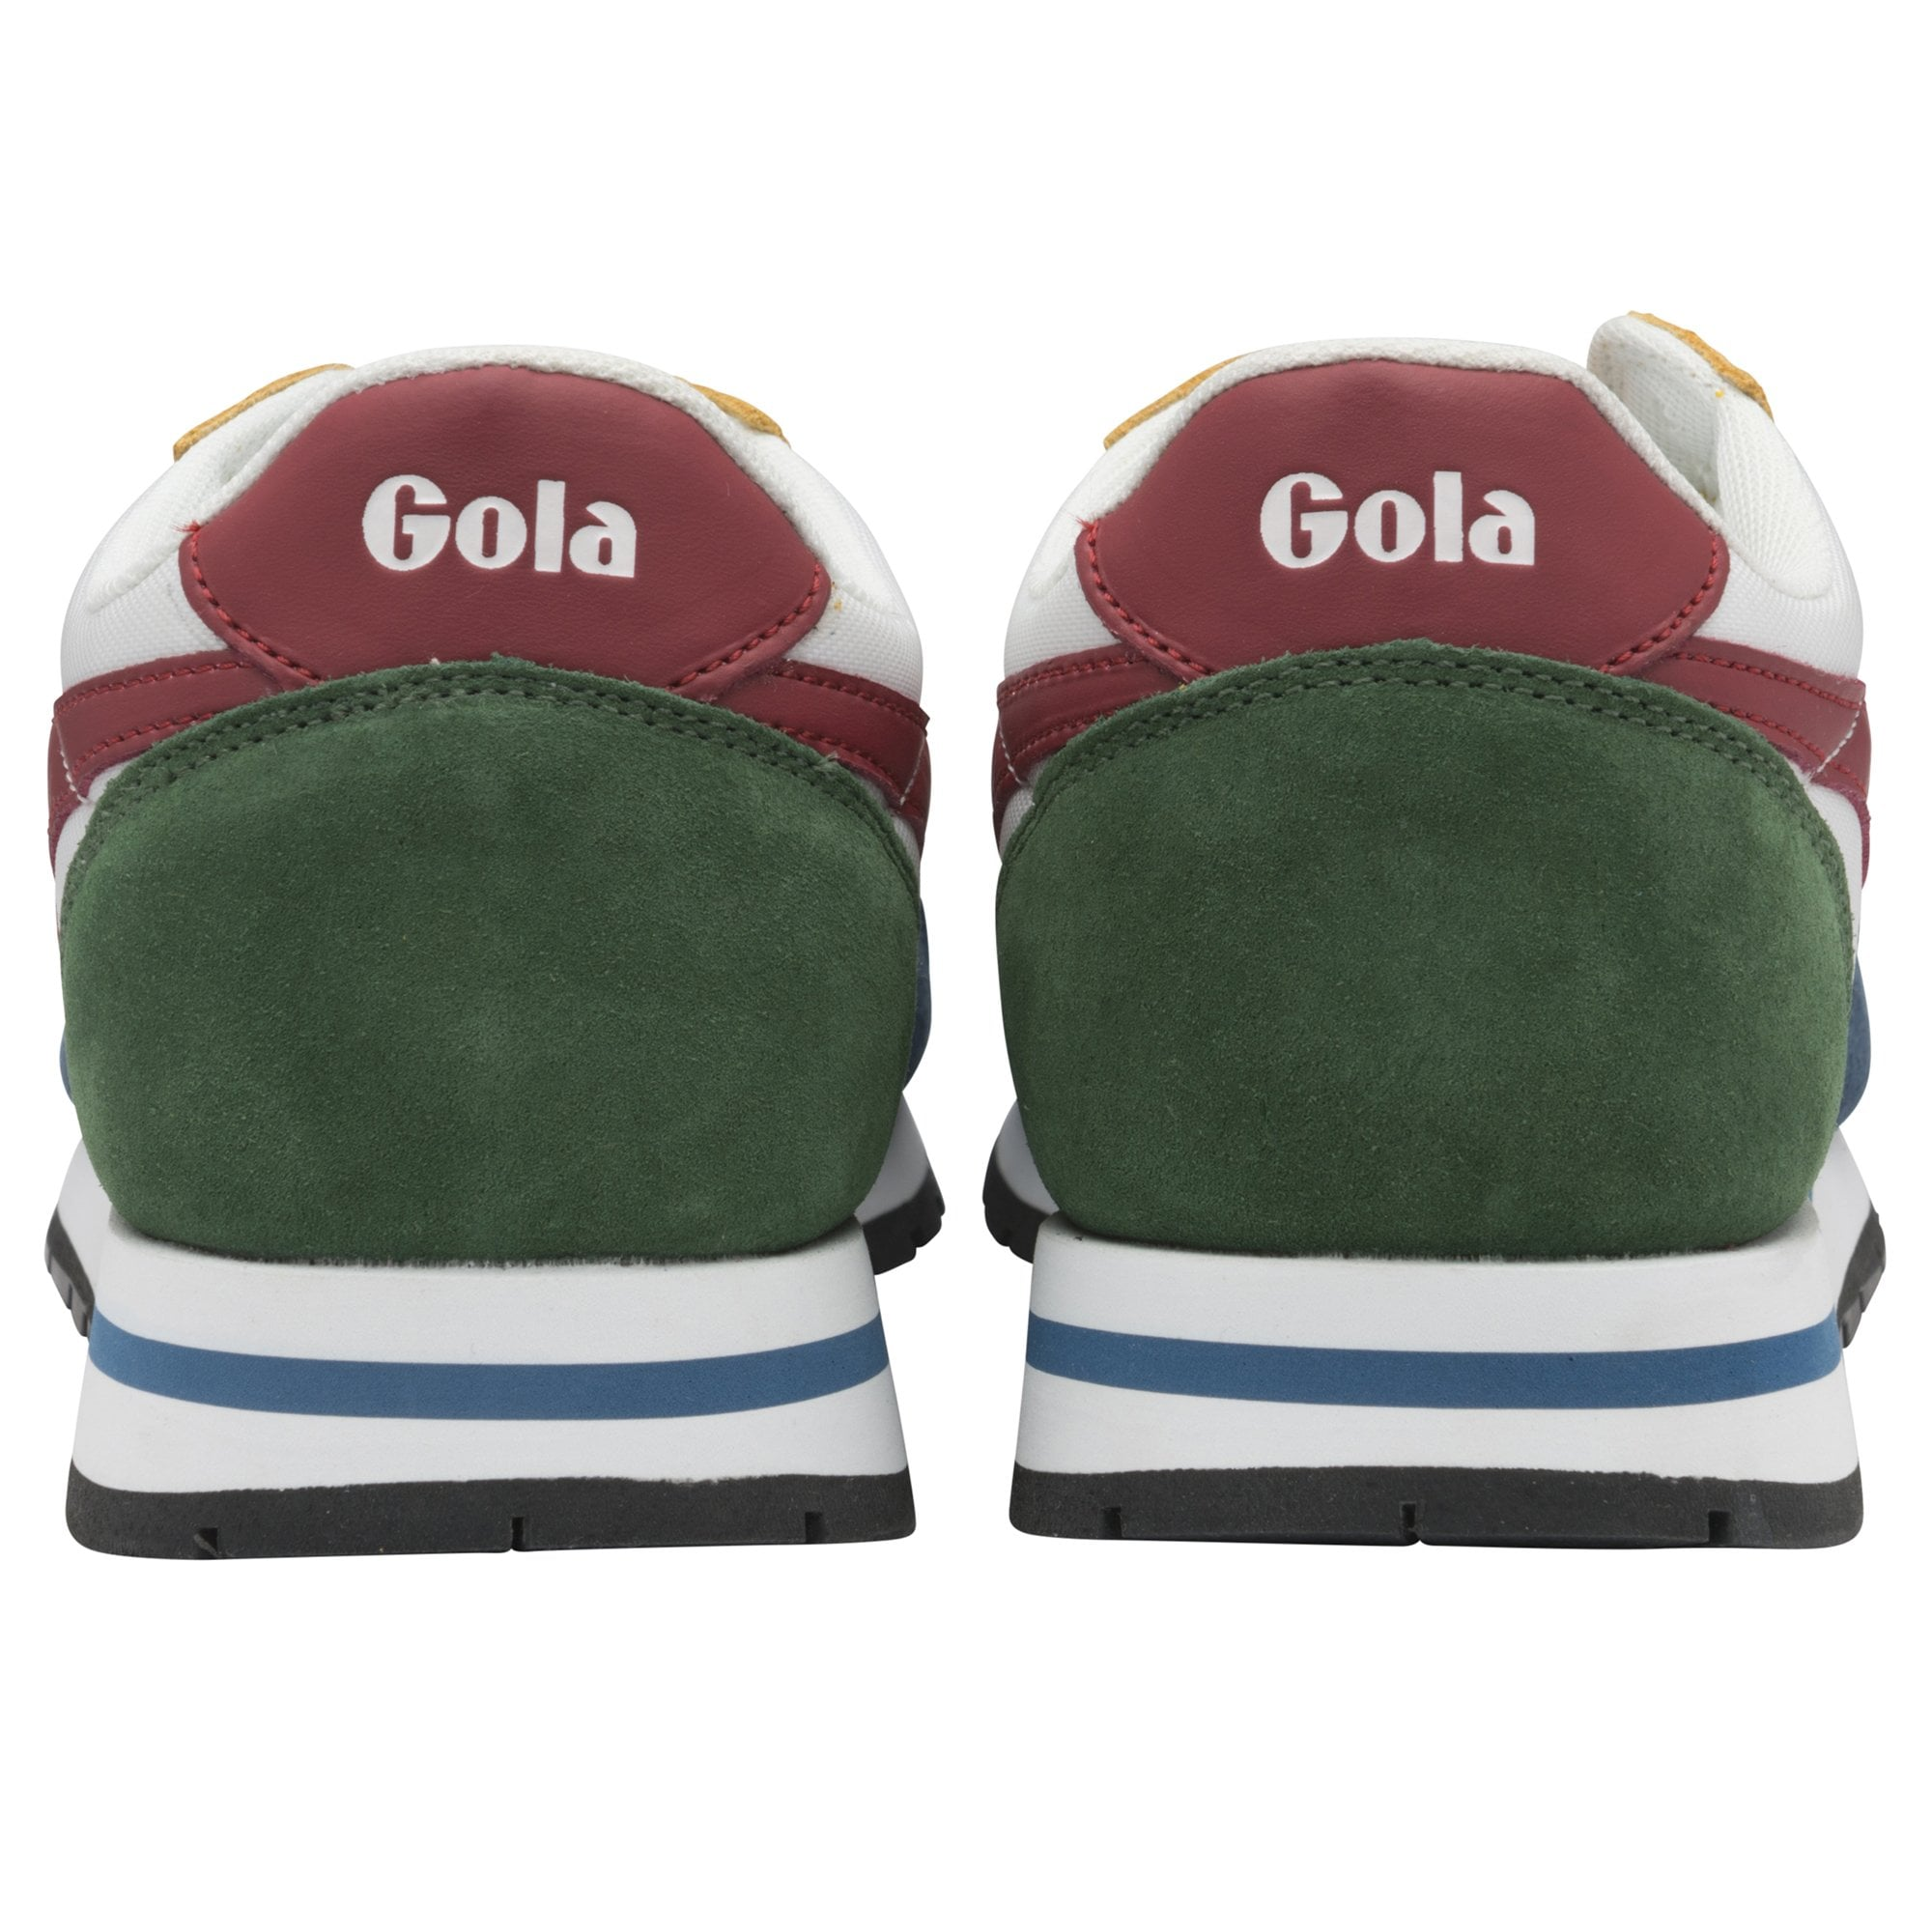 Buy Gola Daytona trainers in white